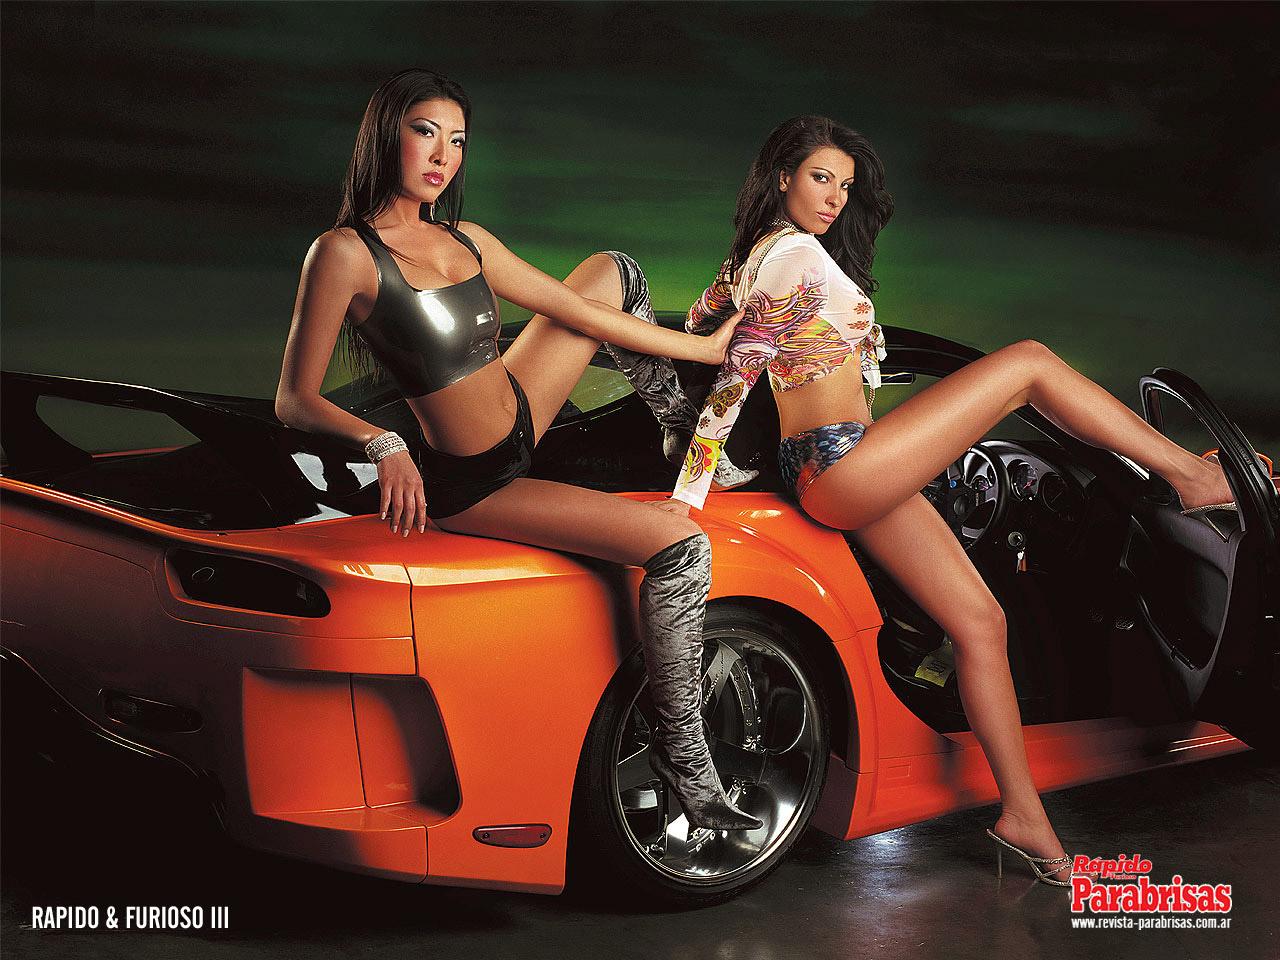 http://3.bp.blogspot.com/-ZmrOfsv6DHw/UL_doyukuII/AAAAAAAAPEA/jWhSztyP11M/s1600/wallpaper-autos-y-chicas-rapido-y-furioso.jpg